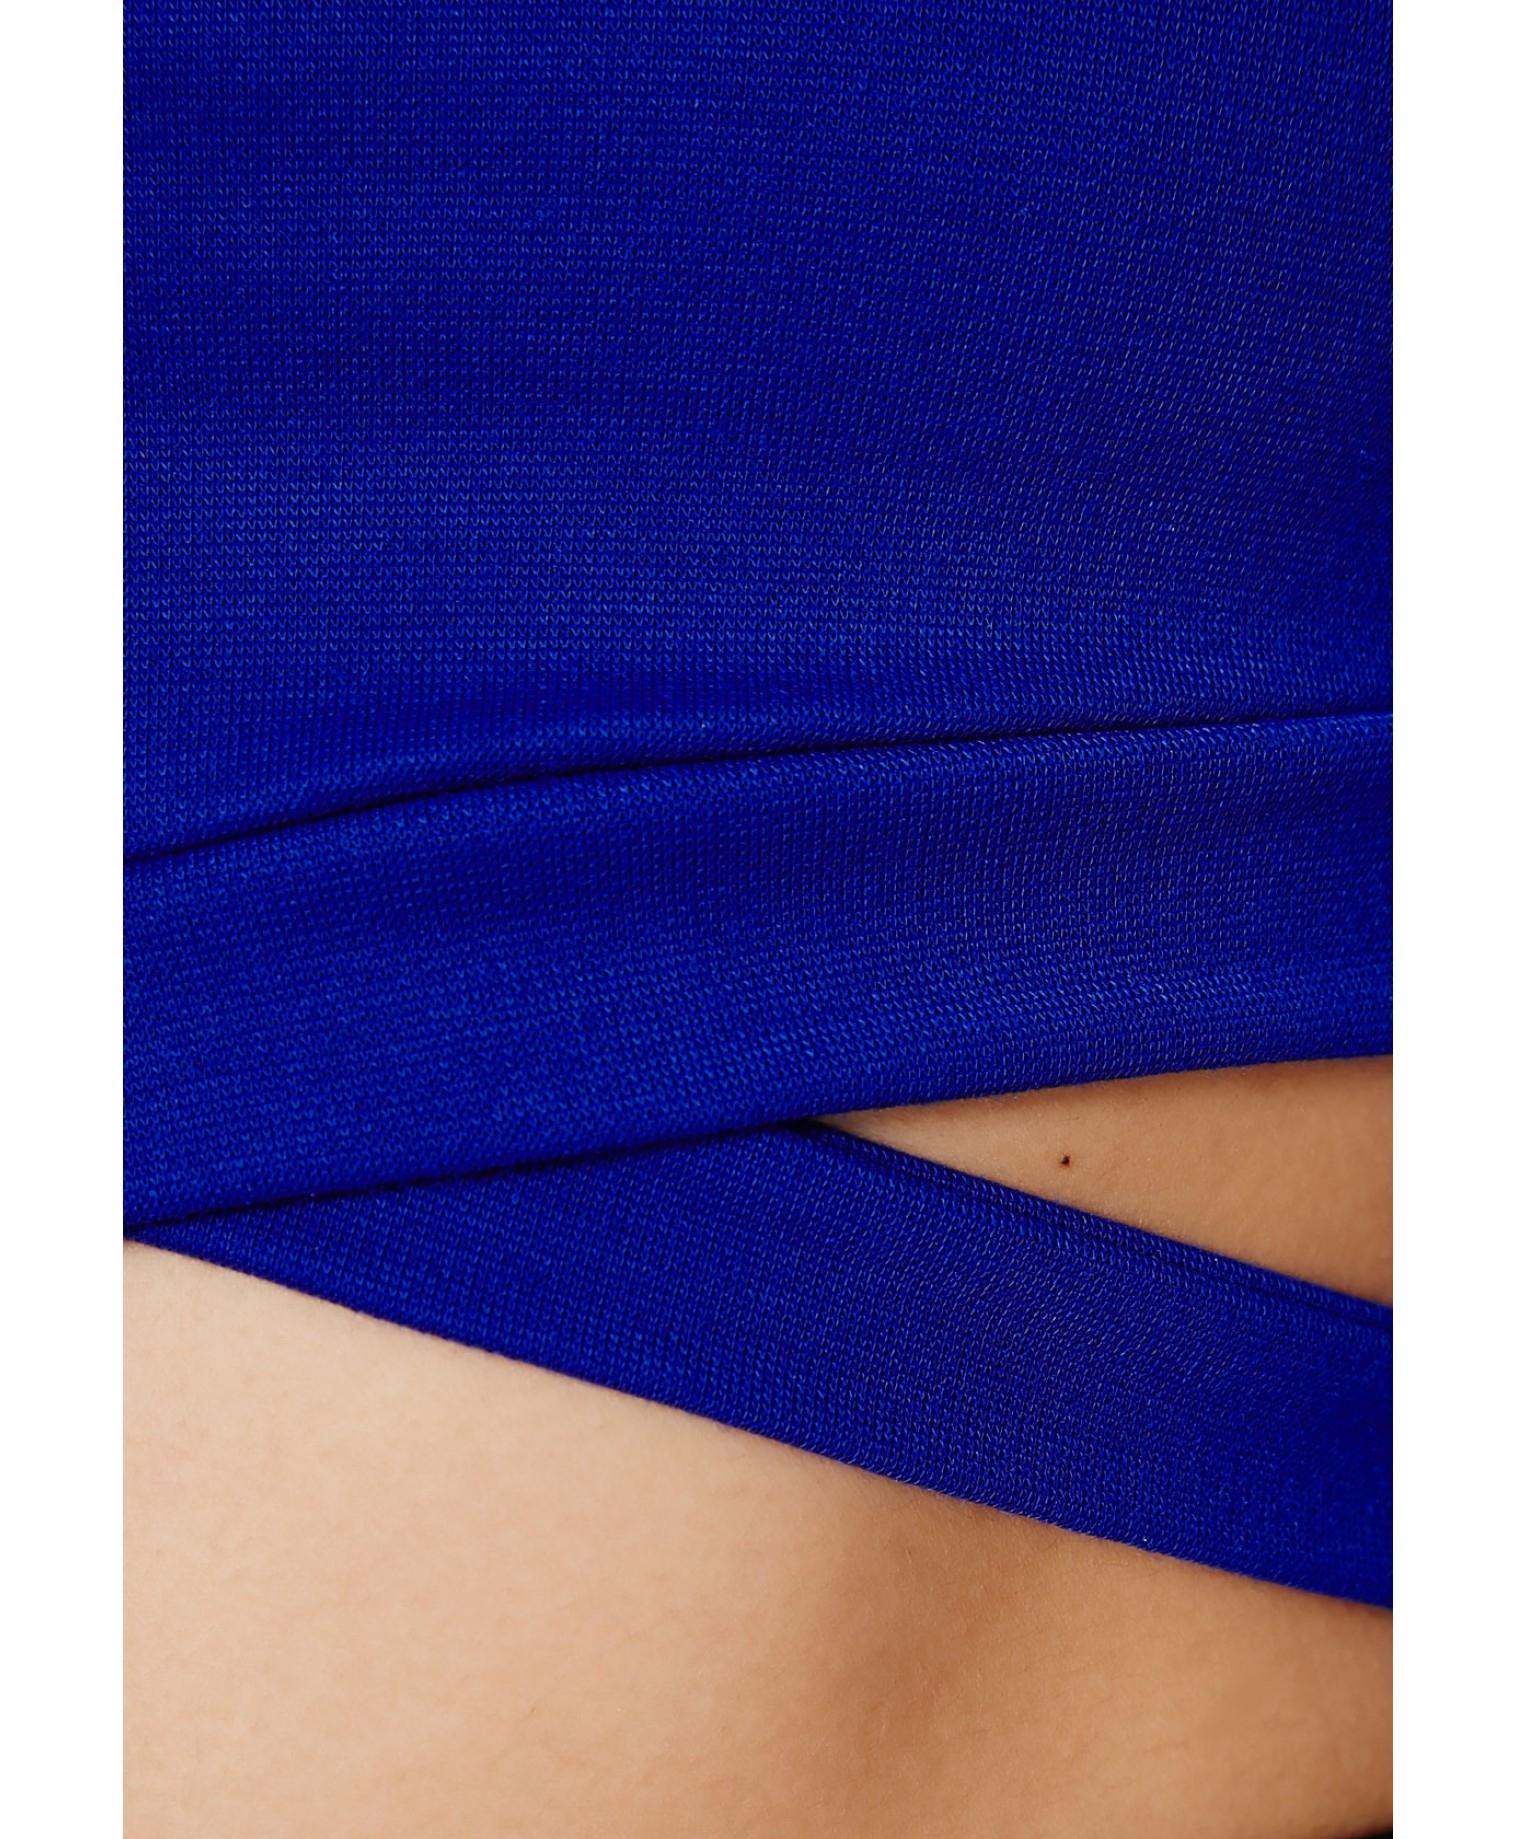 4f6af1428f2142 Lyst - Missguided Chara Bandage Waist Crop Top in Cobalt Blue in Blue